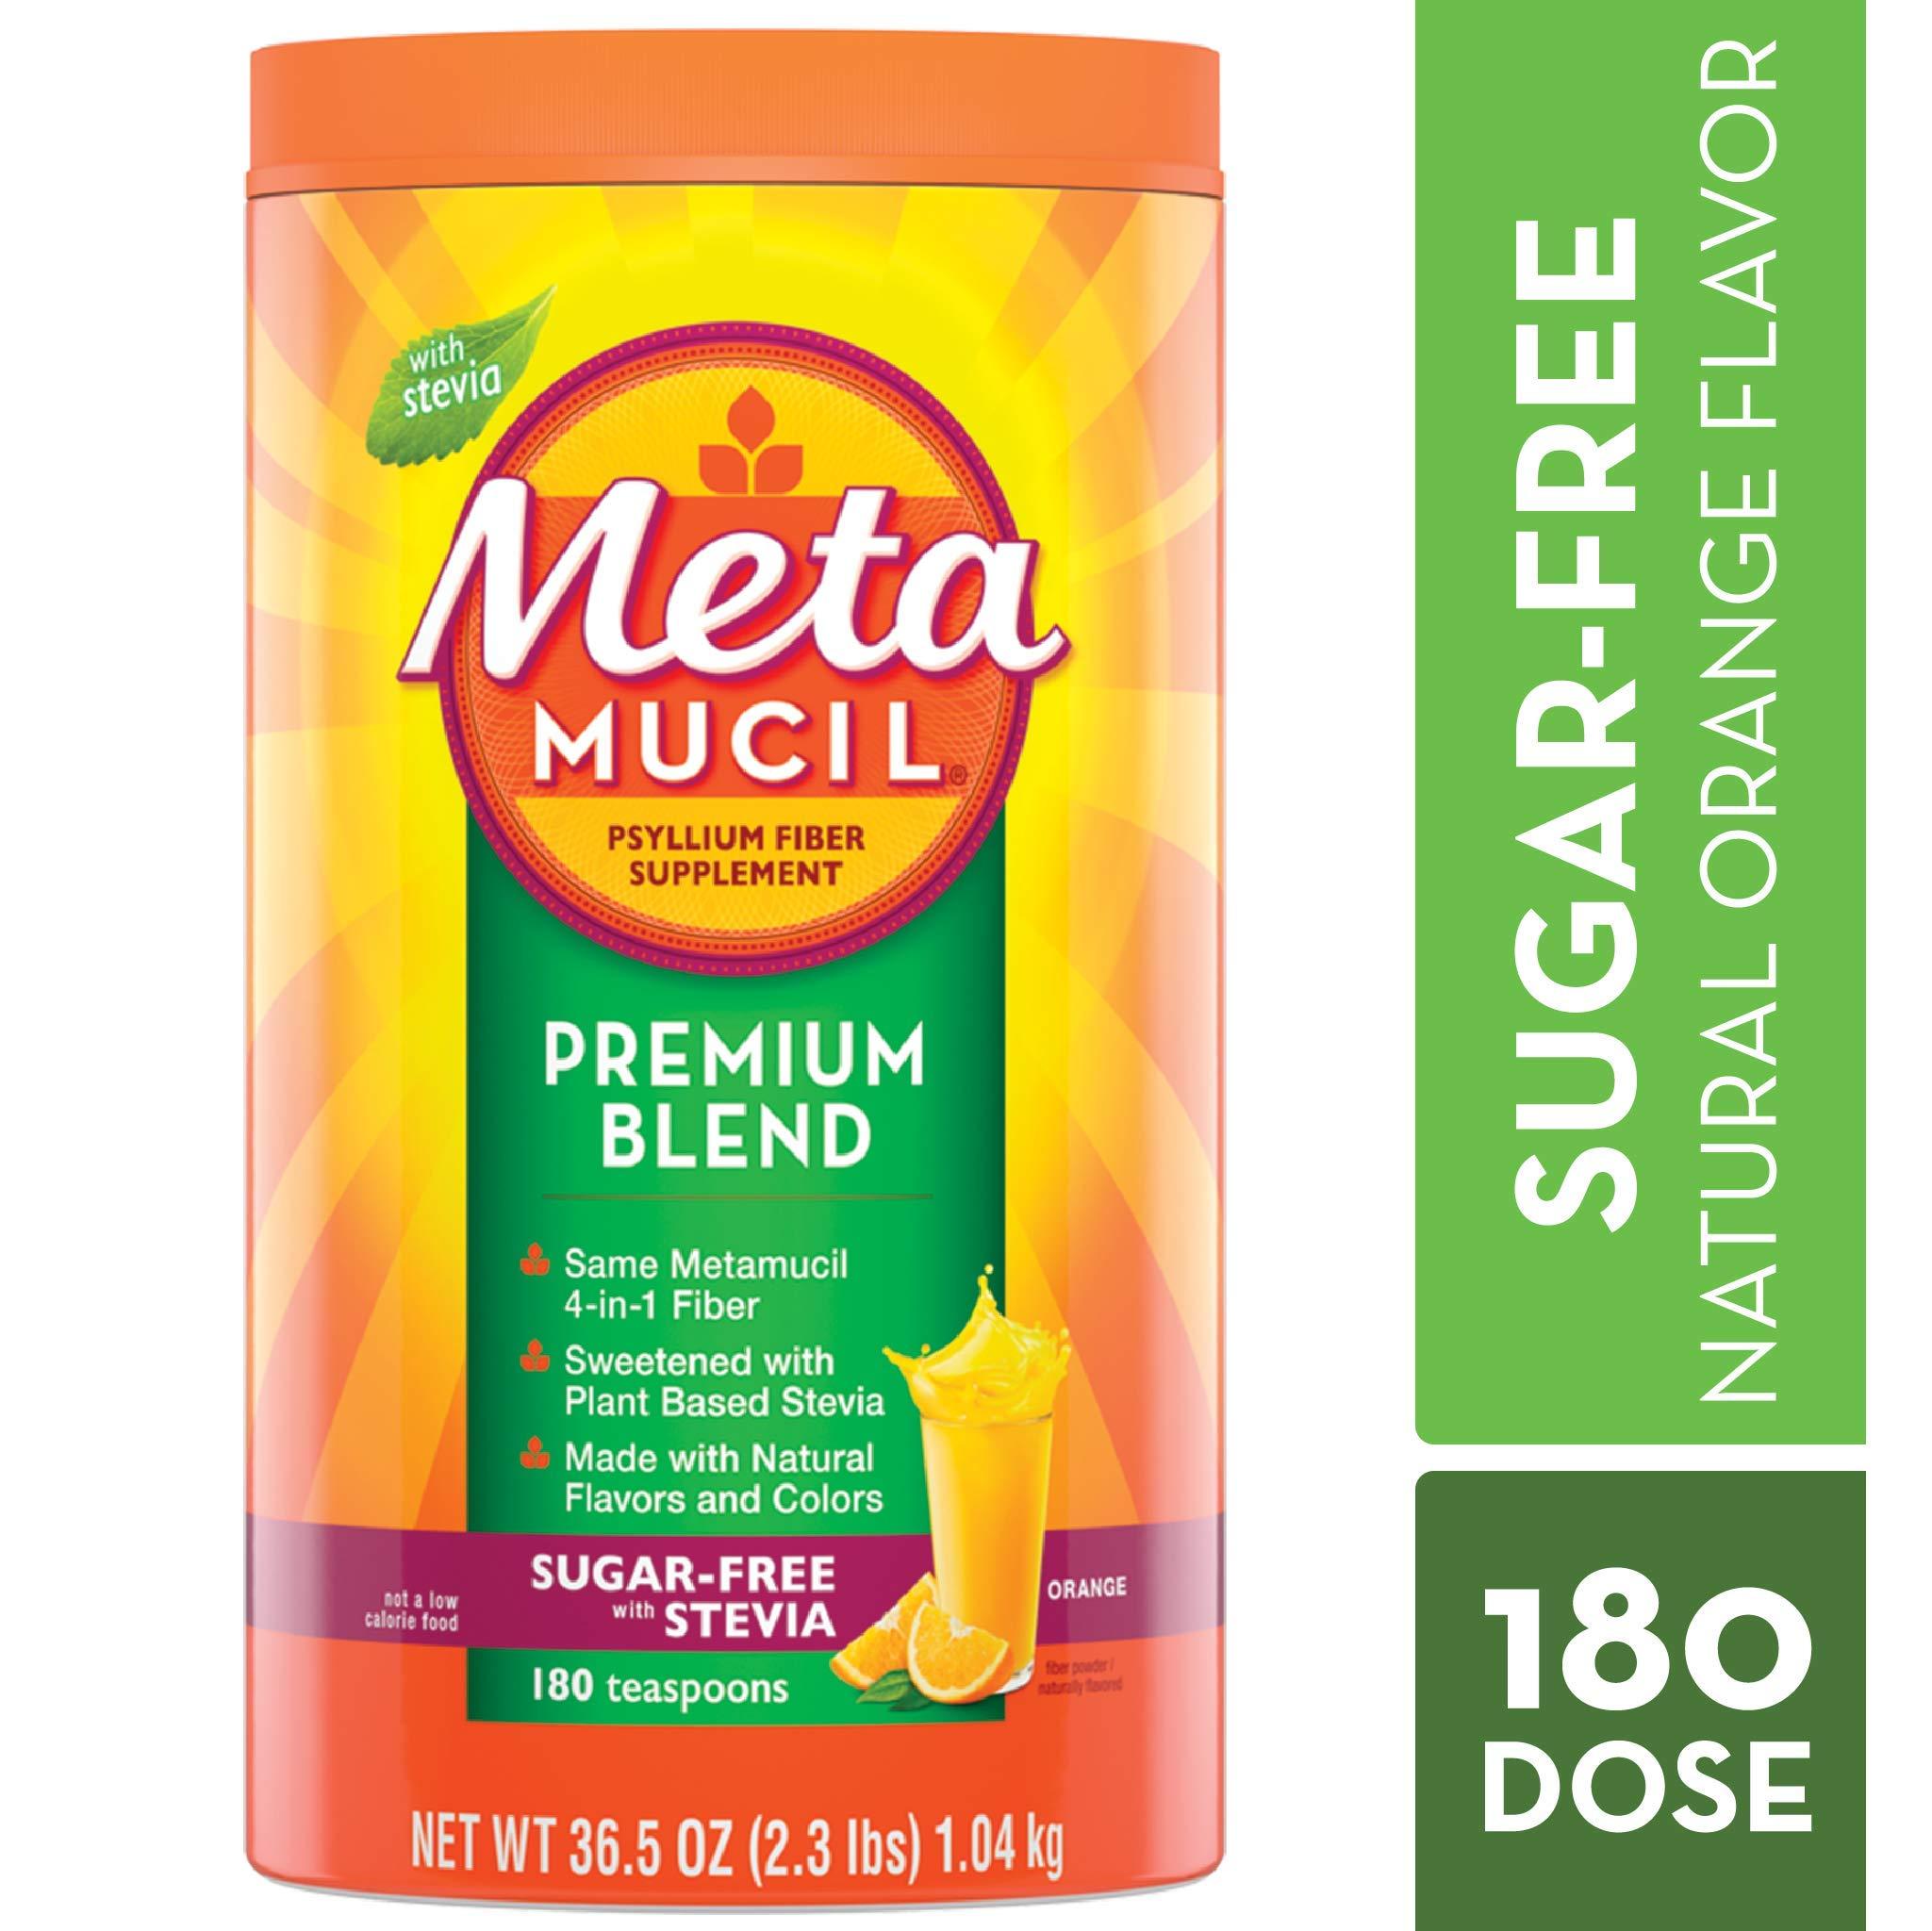 Metamucil Fiber, Premium Blend, Psyllium Fiber Powder Supplement, Sugar-Free with Stevia, Natural Orange Flavor, 180 Servings, 36.5 Ounce by Metamucil